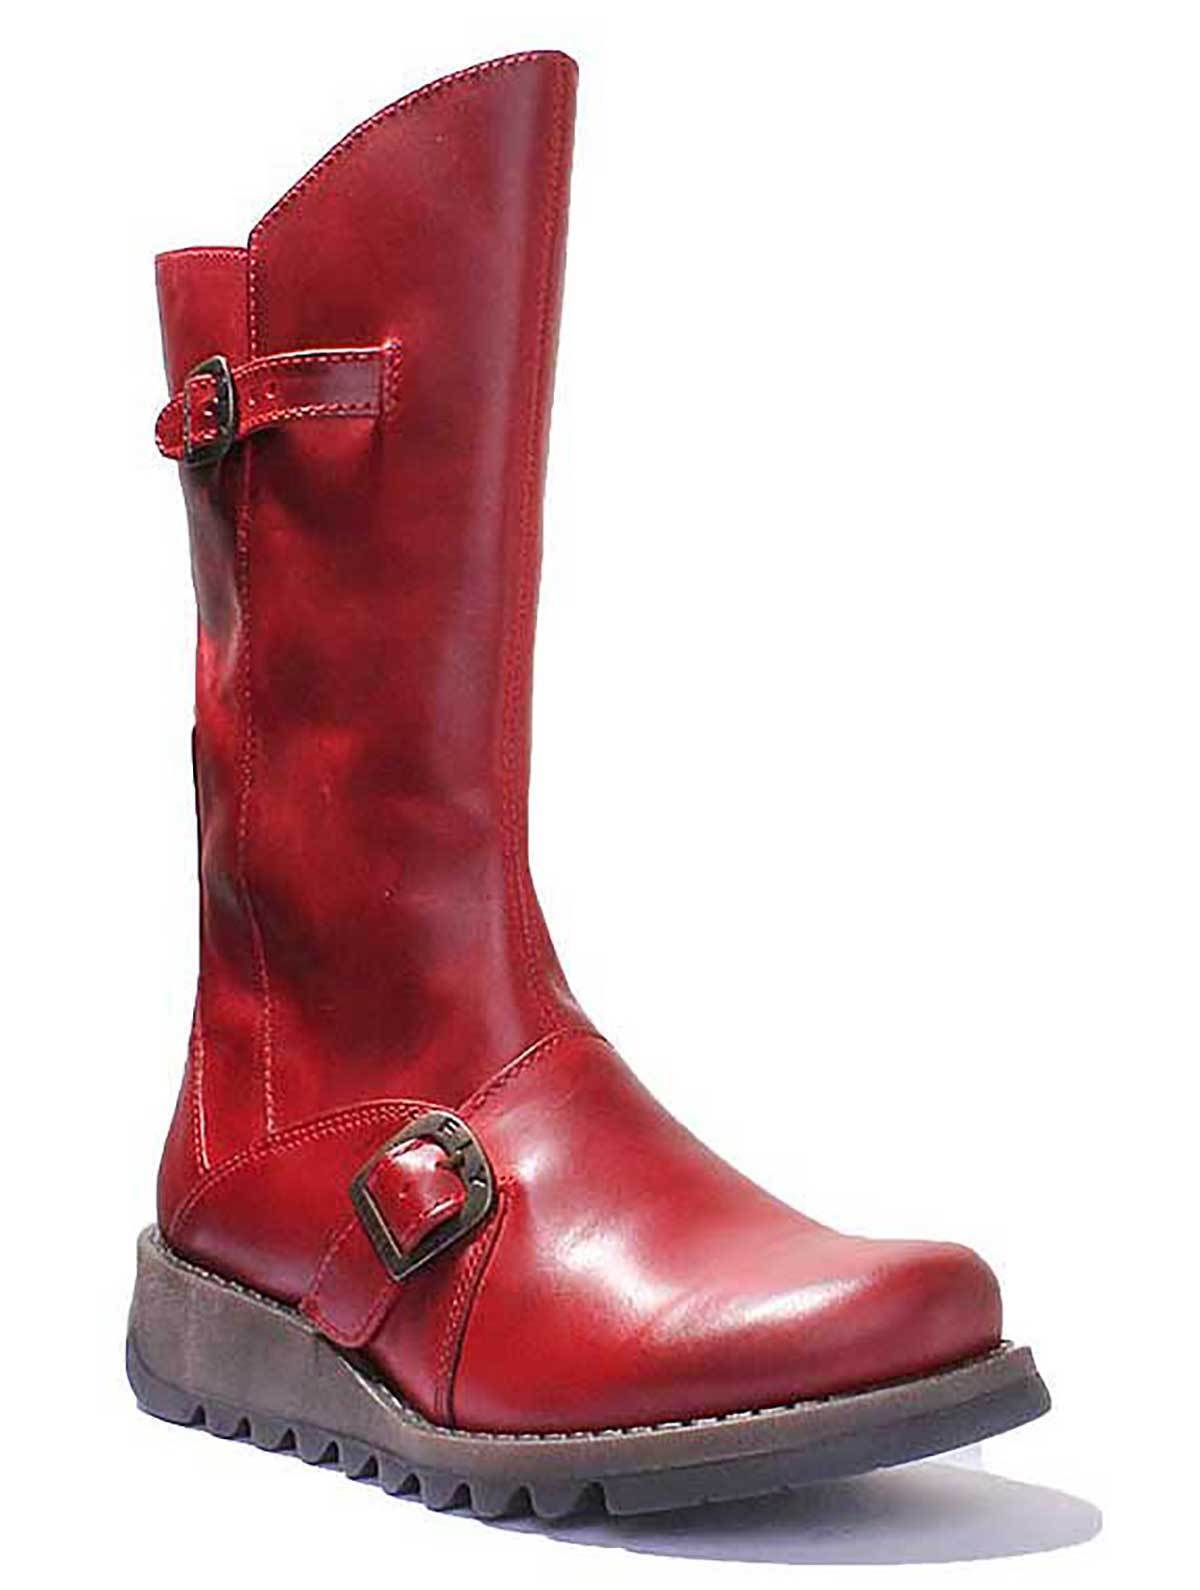 MARC CAIN DAMEN Chelsea Boots Stiefeletten Schlupfschuhe